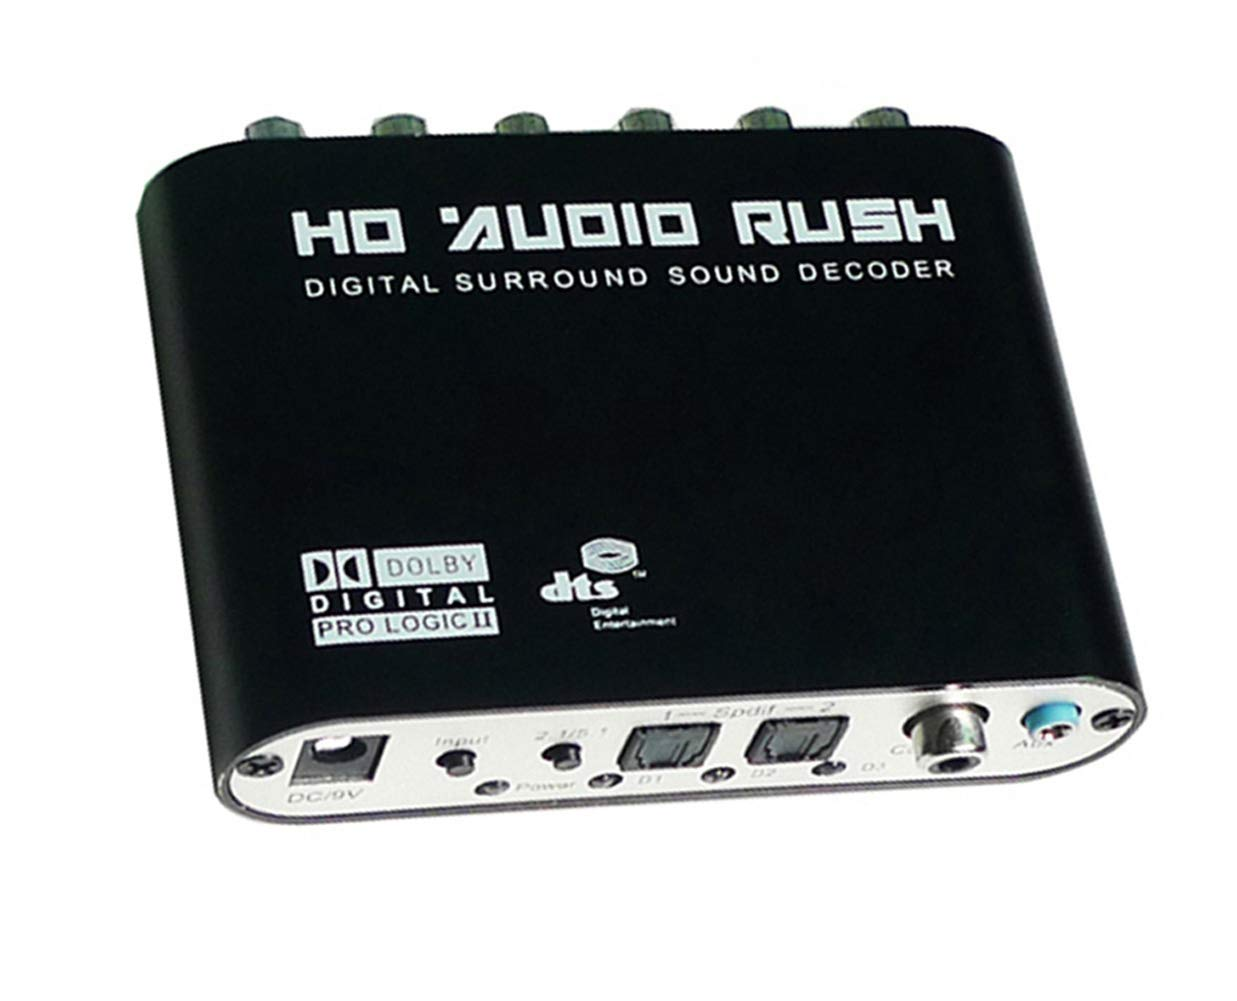 Luzan 5.1 Audio Fiebre Digital Sound Decoder Convertidor ó ptico SPDIF coaxial Dolby AC3 DTS (R/L) esté reo a 5, 1 ch analó gico Audio (6RCA de salida) 1ch analógico Audio (6RCA de salida) NQ017B-51R